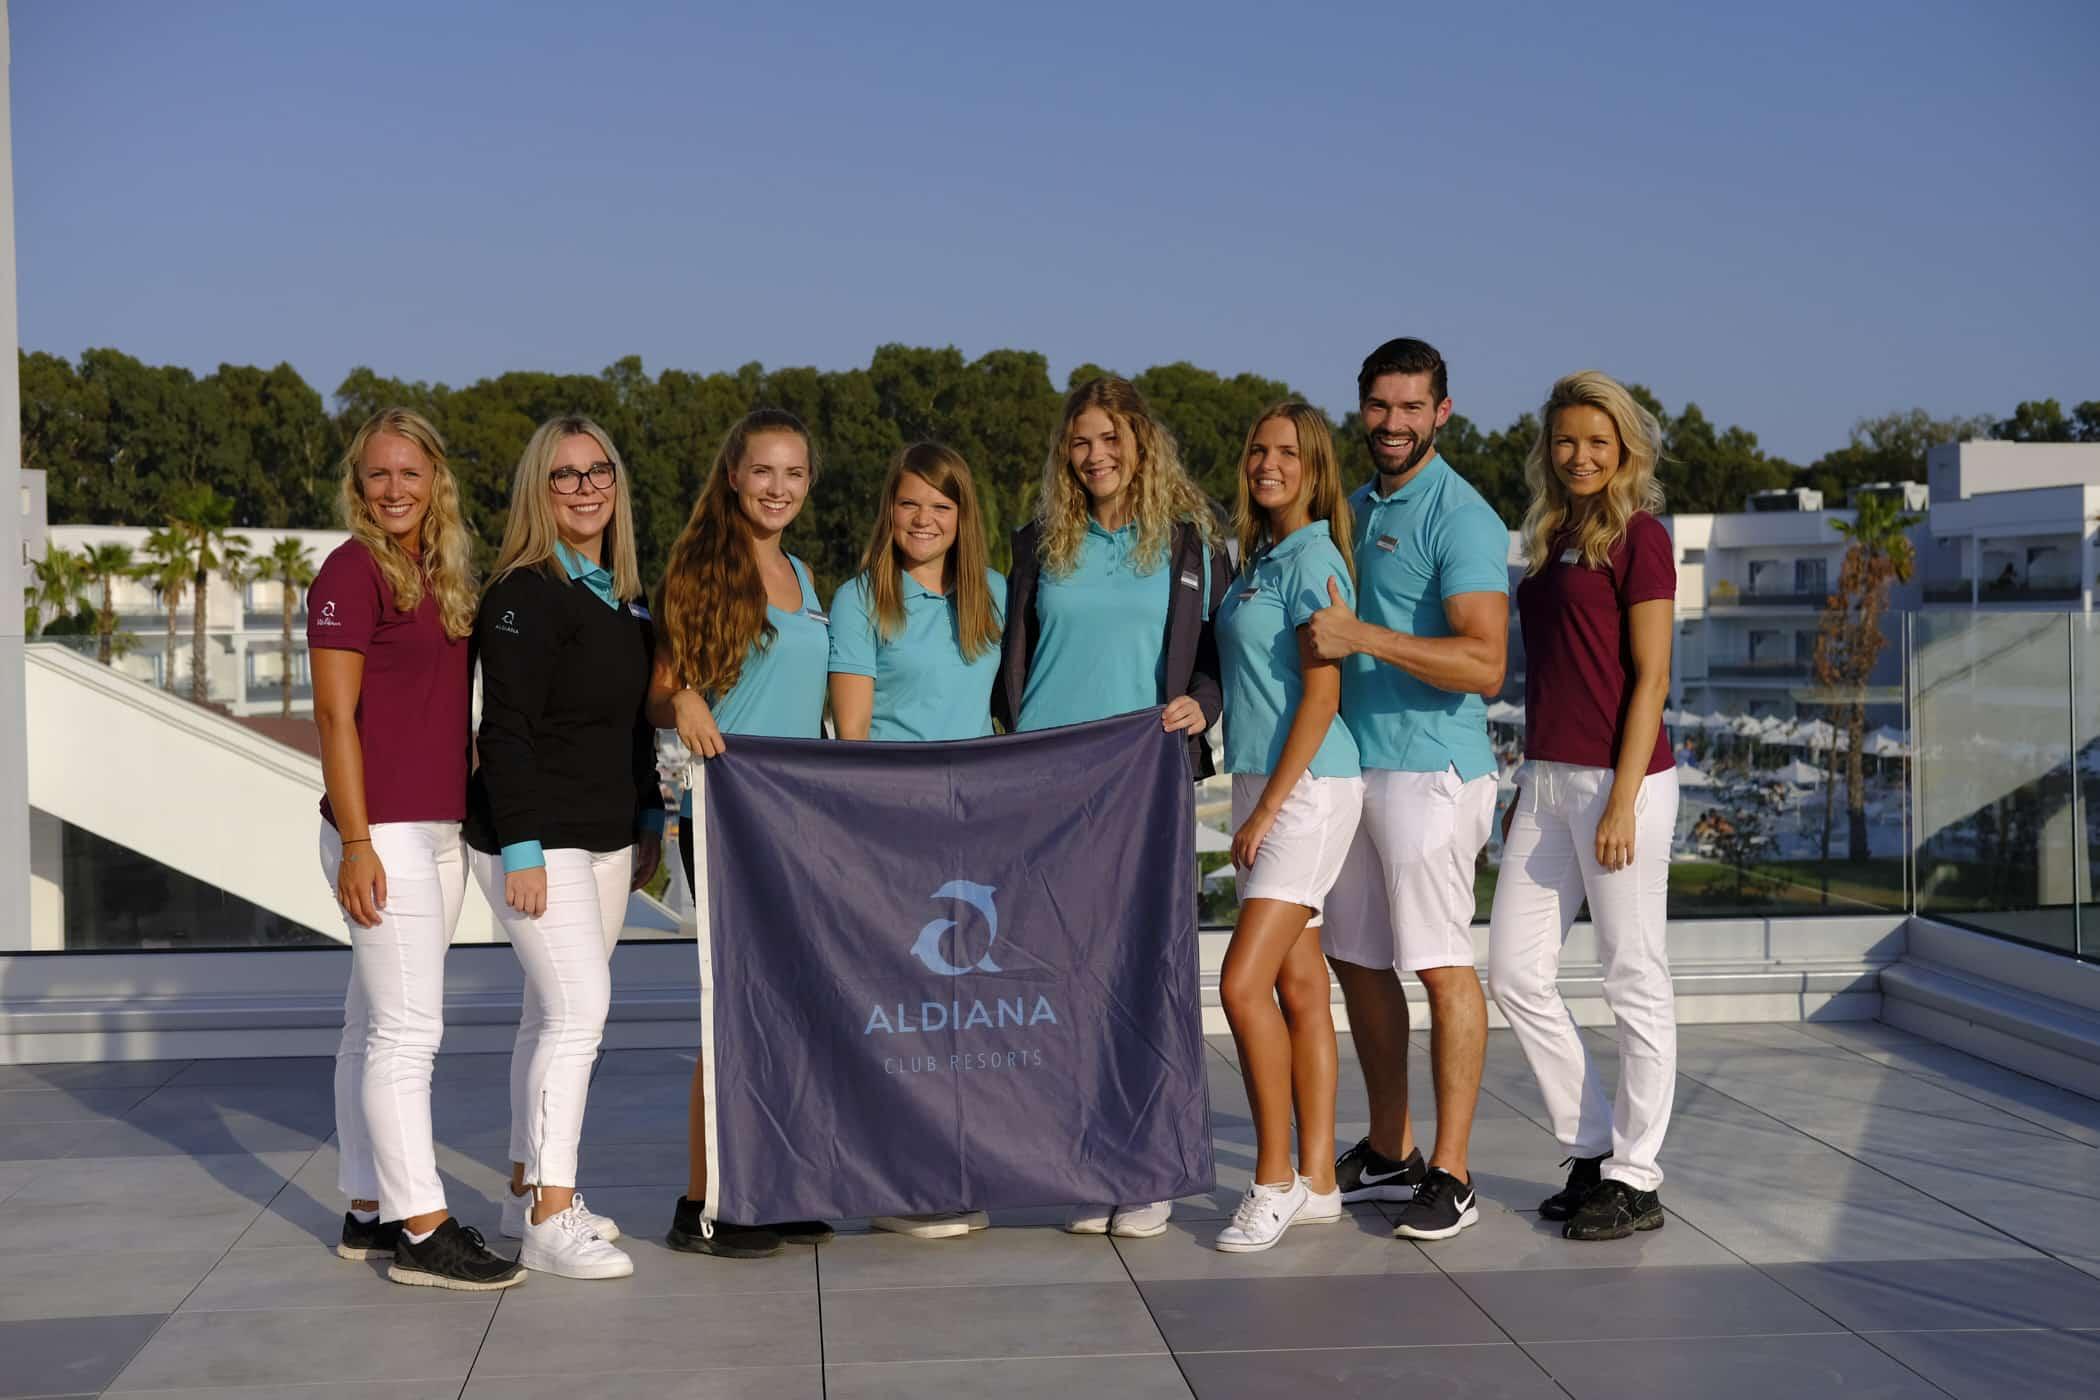 Aldiana-Mitarbeiterbekleidung-Teamwear-Corporate-Fashion-Hotel-Shirt-Poloshirt-Hose-Jacke-Stick-Branding